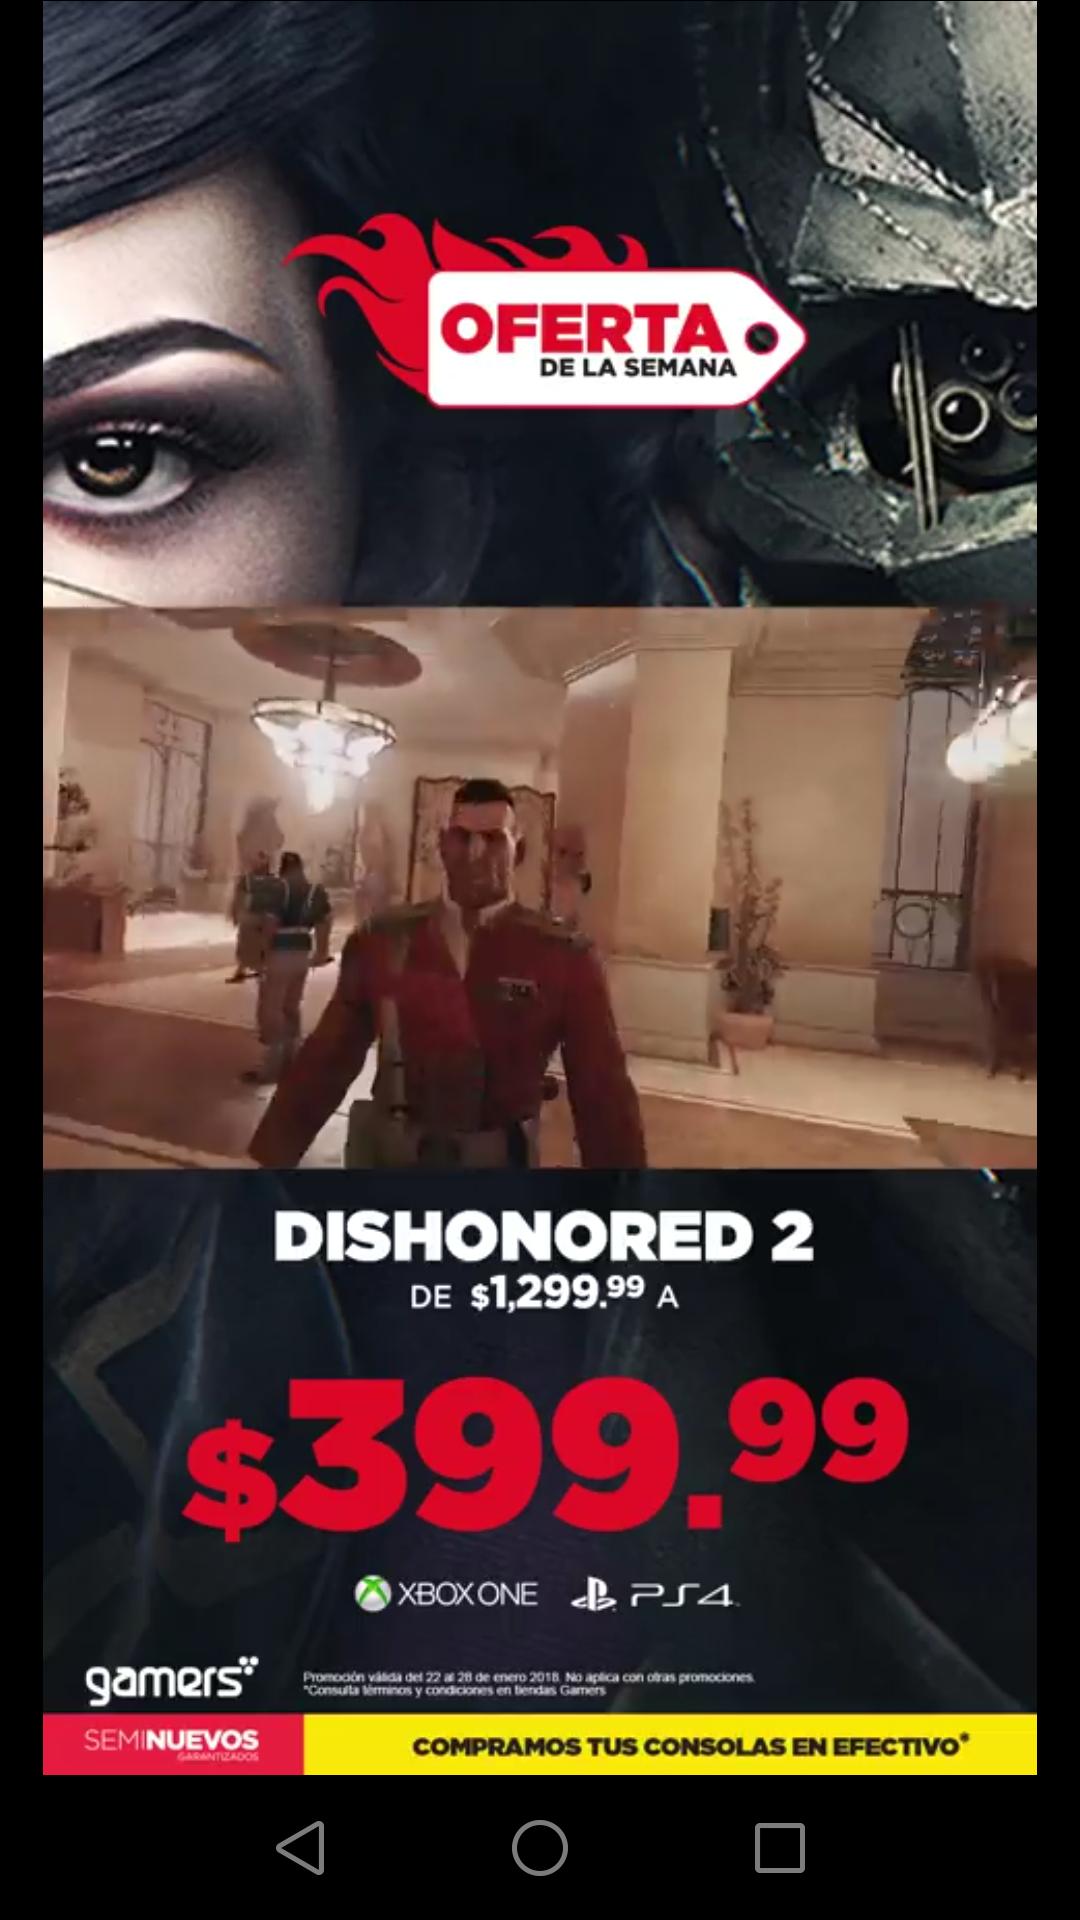 GAMERS: Dishonored 2 en oferta